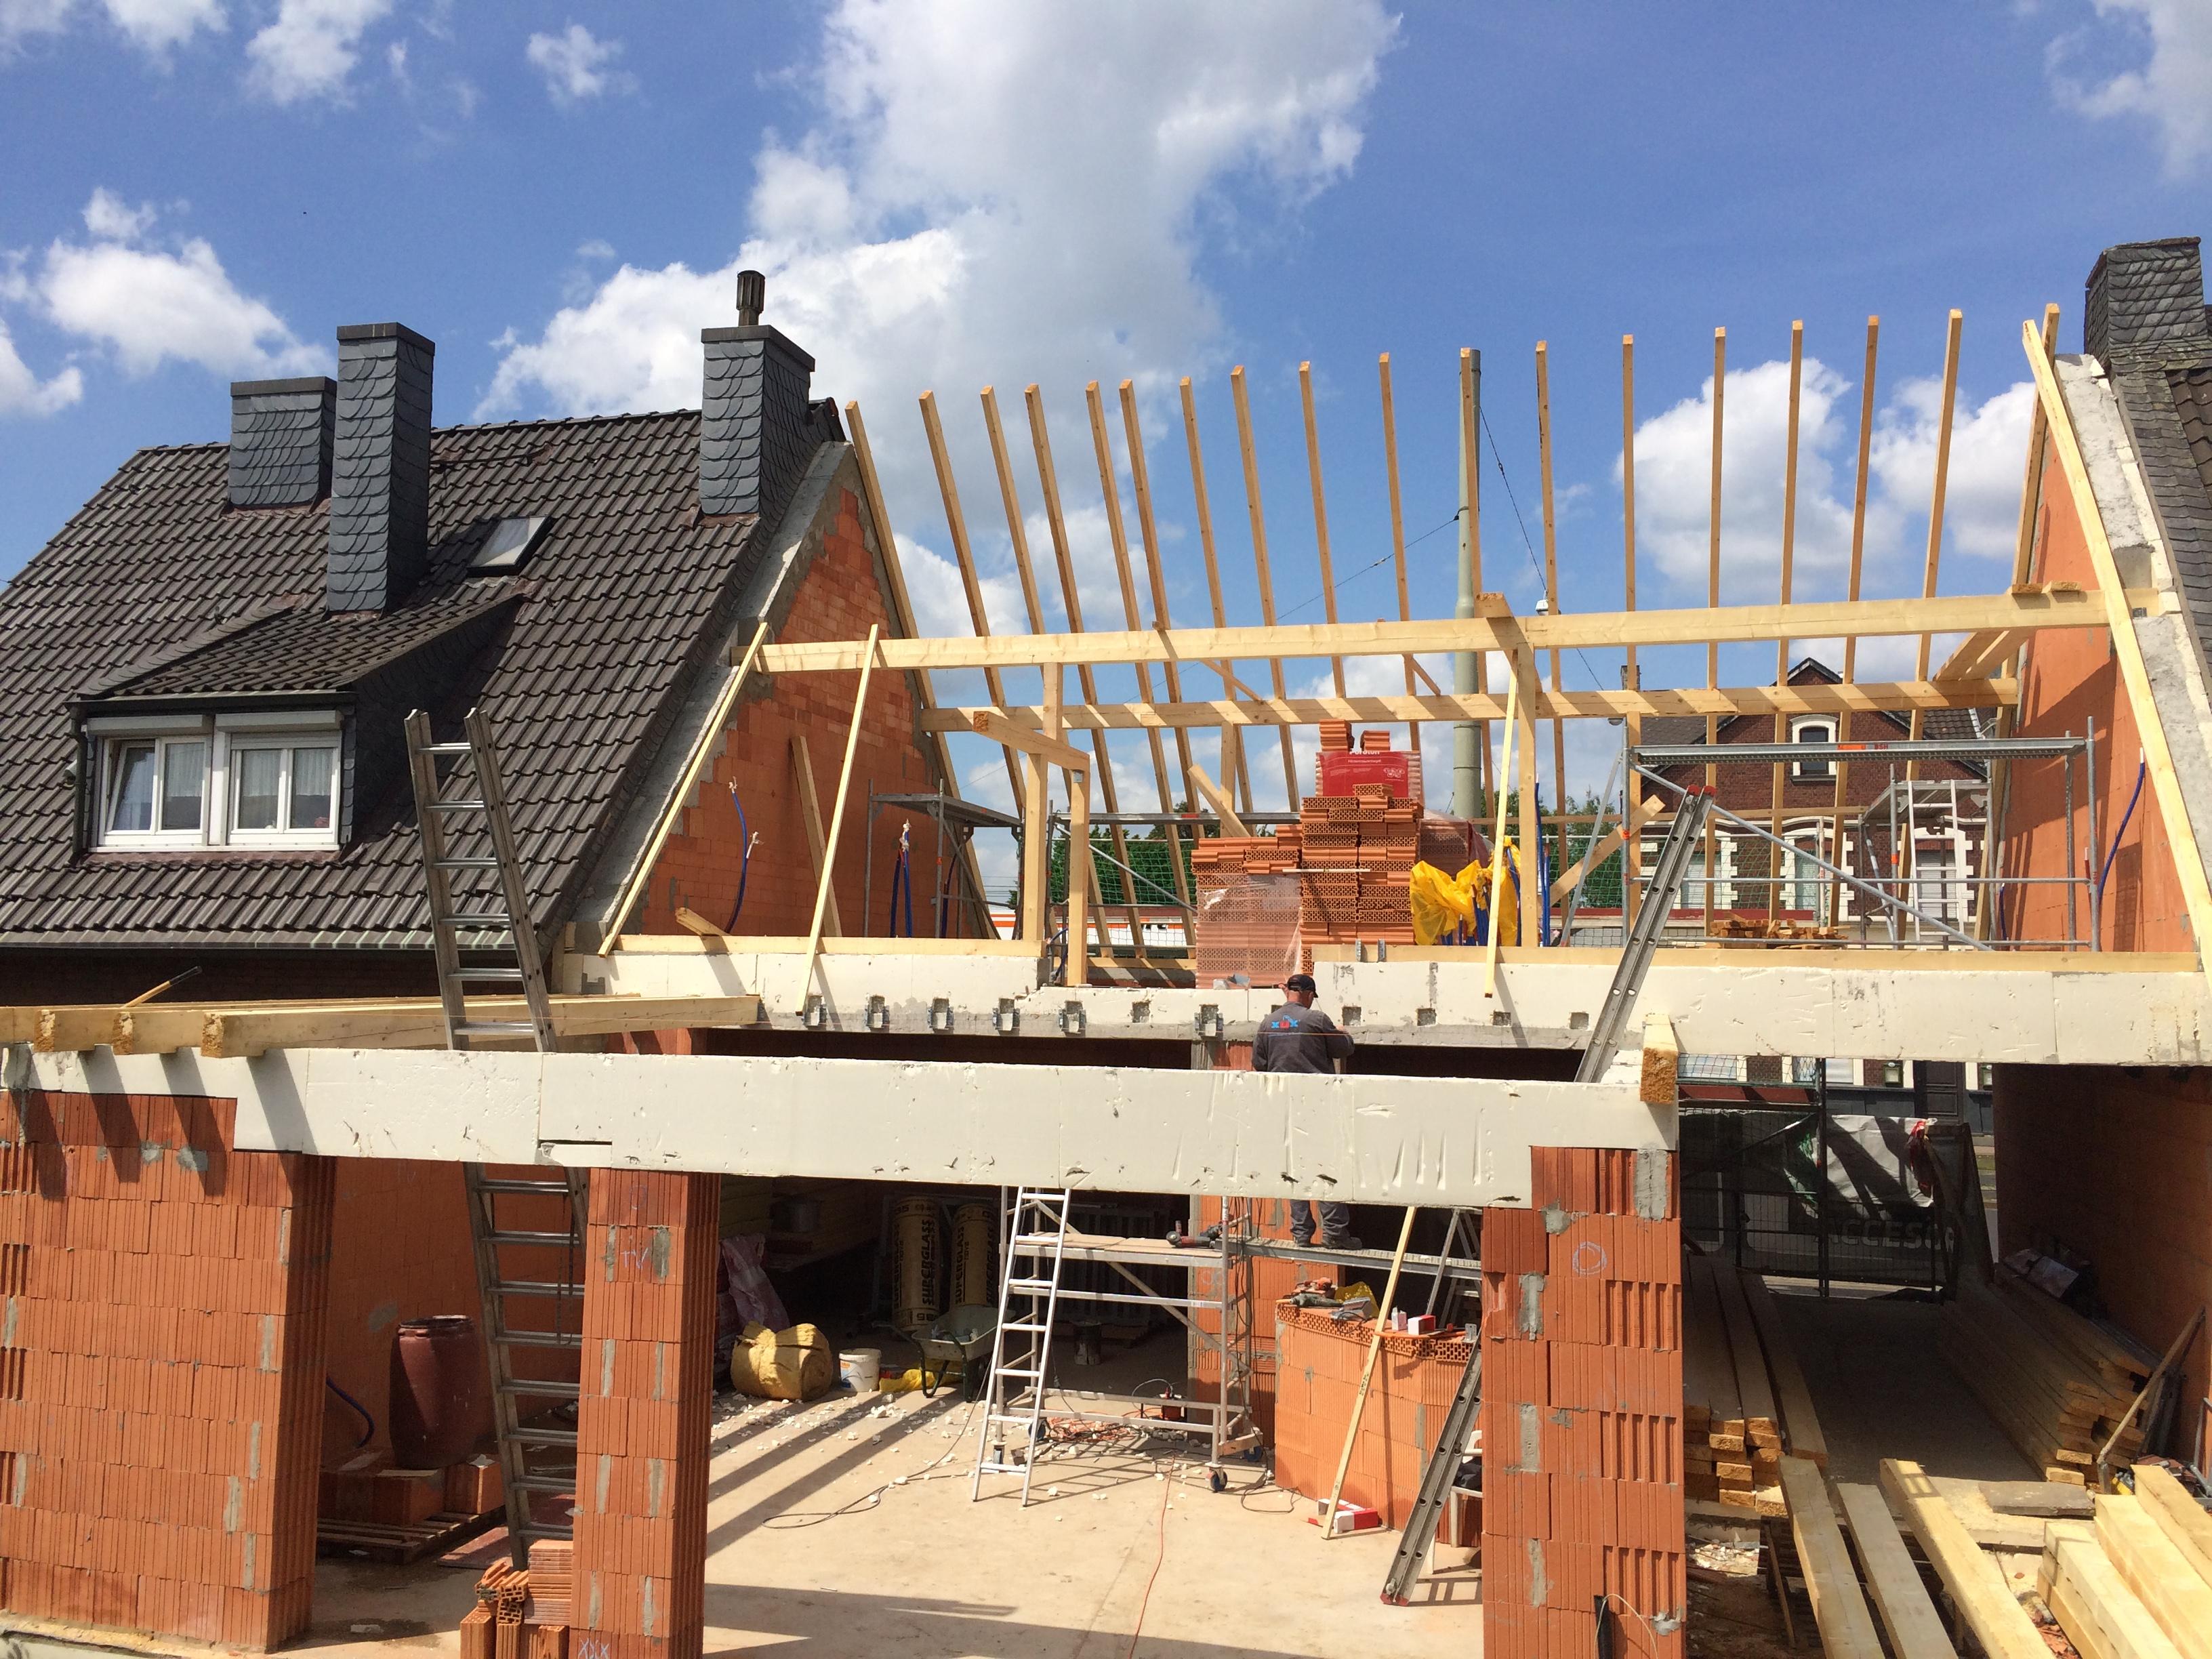 Casa krefeld germania firma de constructii sibiu xuxinvestment ro - Casa in germania ...